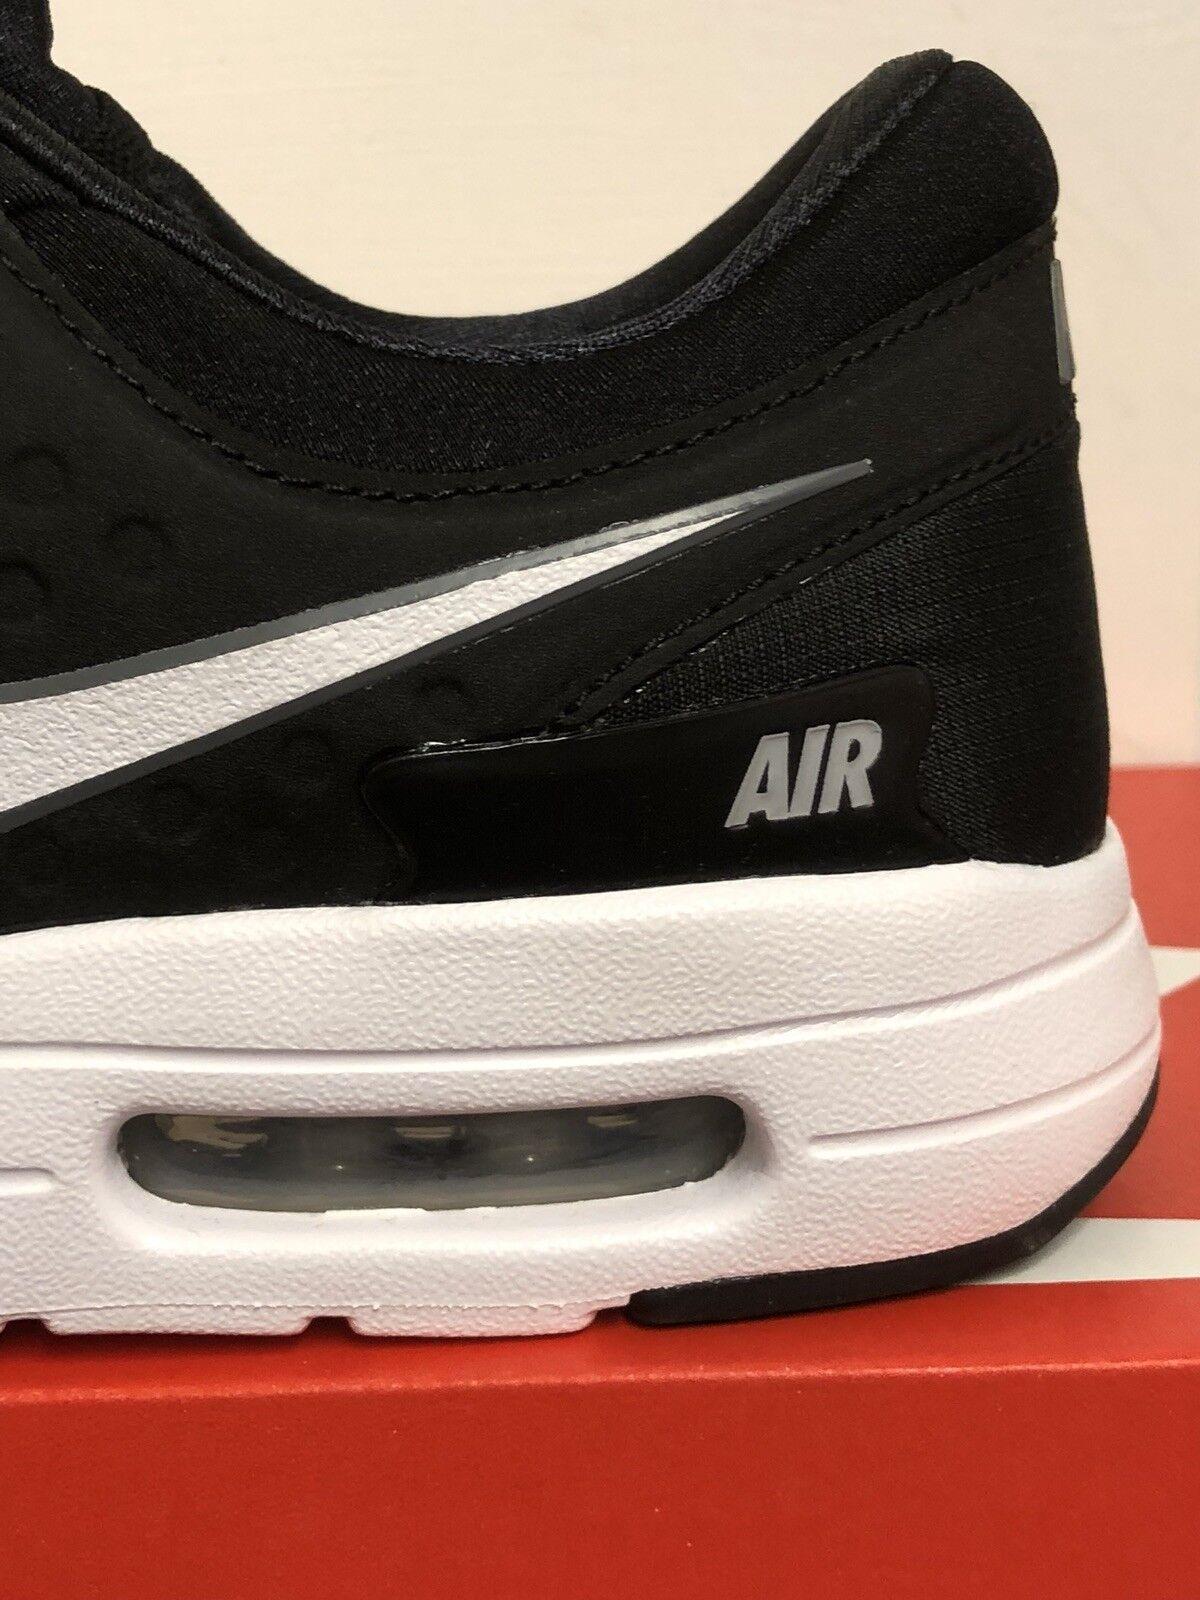 Nike Air Air Nike Max Zero Essentiel Baskets Homme Baskets Chaussures UK 5,5 Eur 38,5 01896d